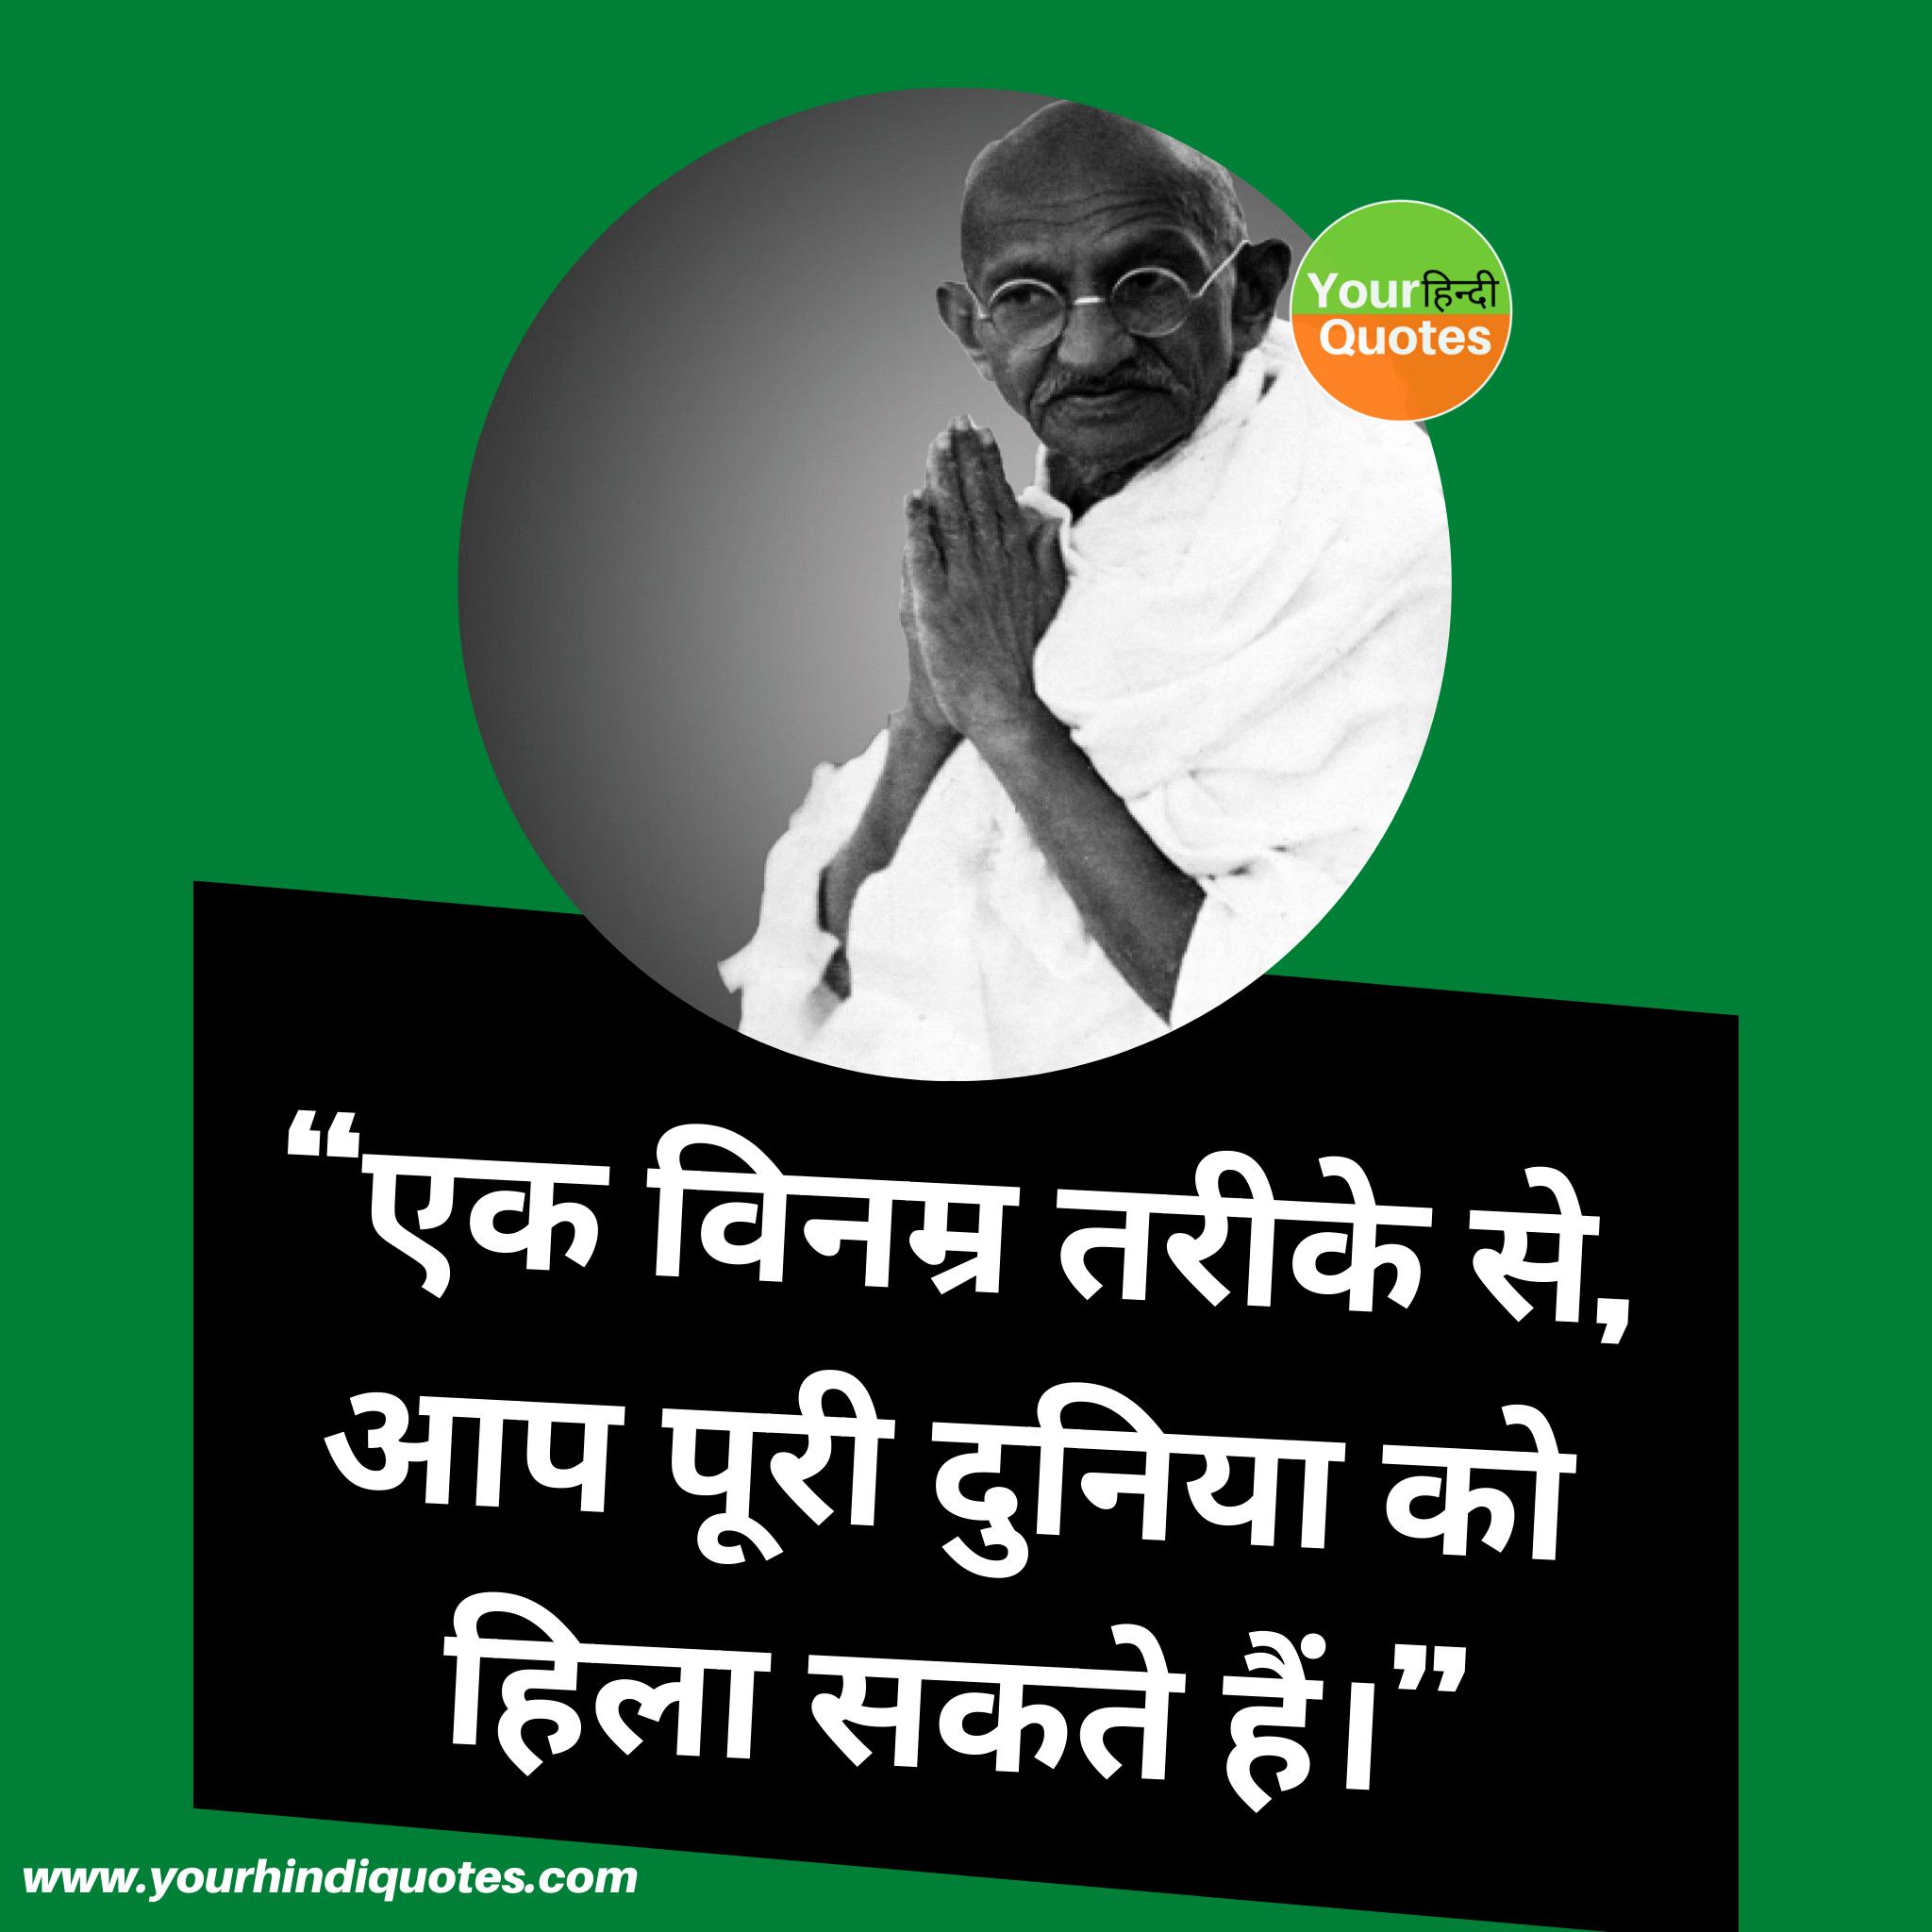 Mahatma Gandhi Quotes Hindi Wallpaper